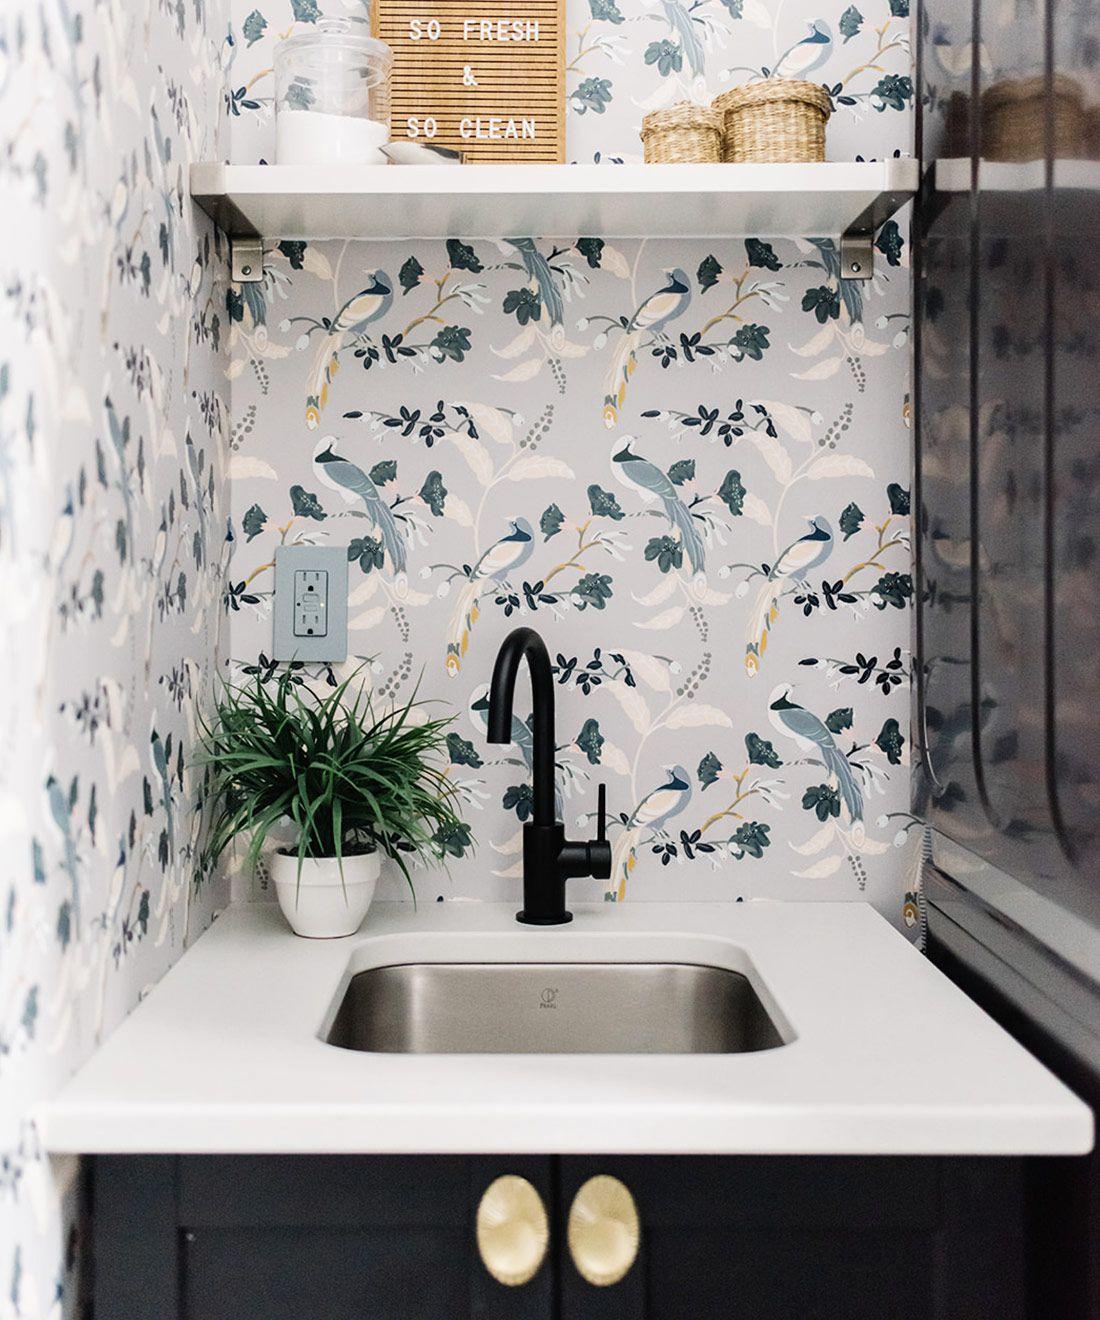 Birds Of Paradise • Grey Wallpaper • Laundry Room Wallpaper • Bird Wallpaper Behind The Sink